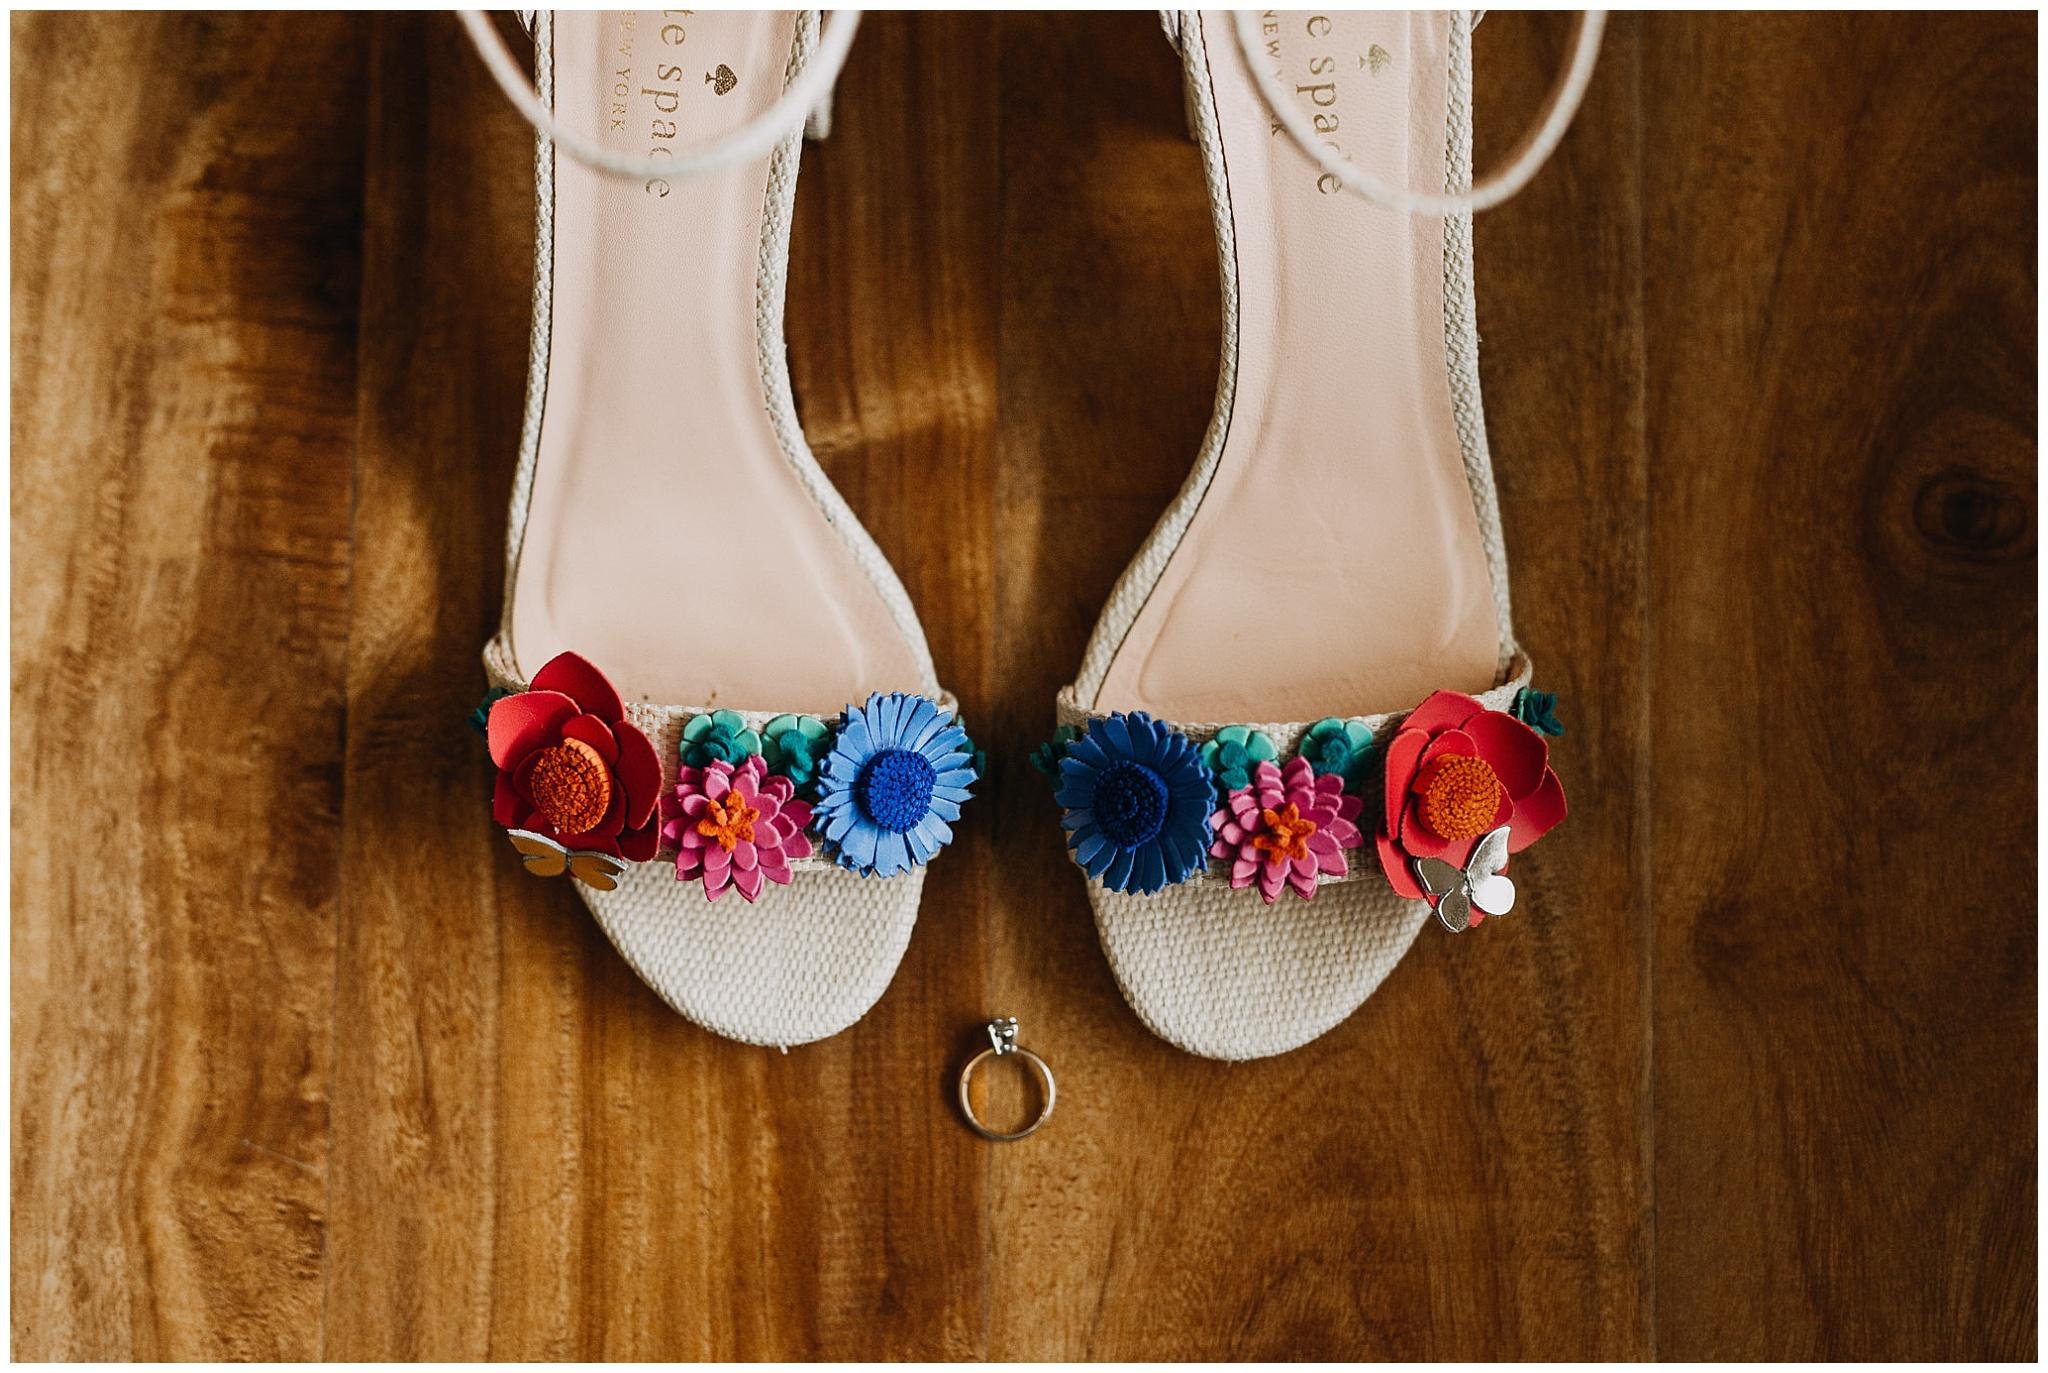 kate spade wedding shoes for bride